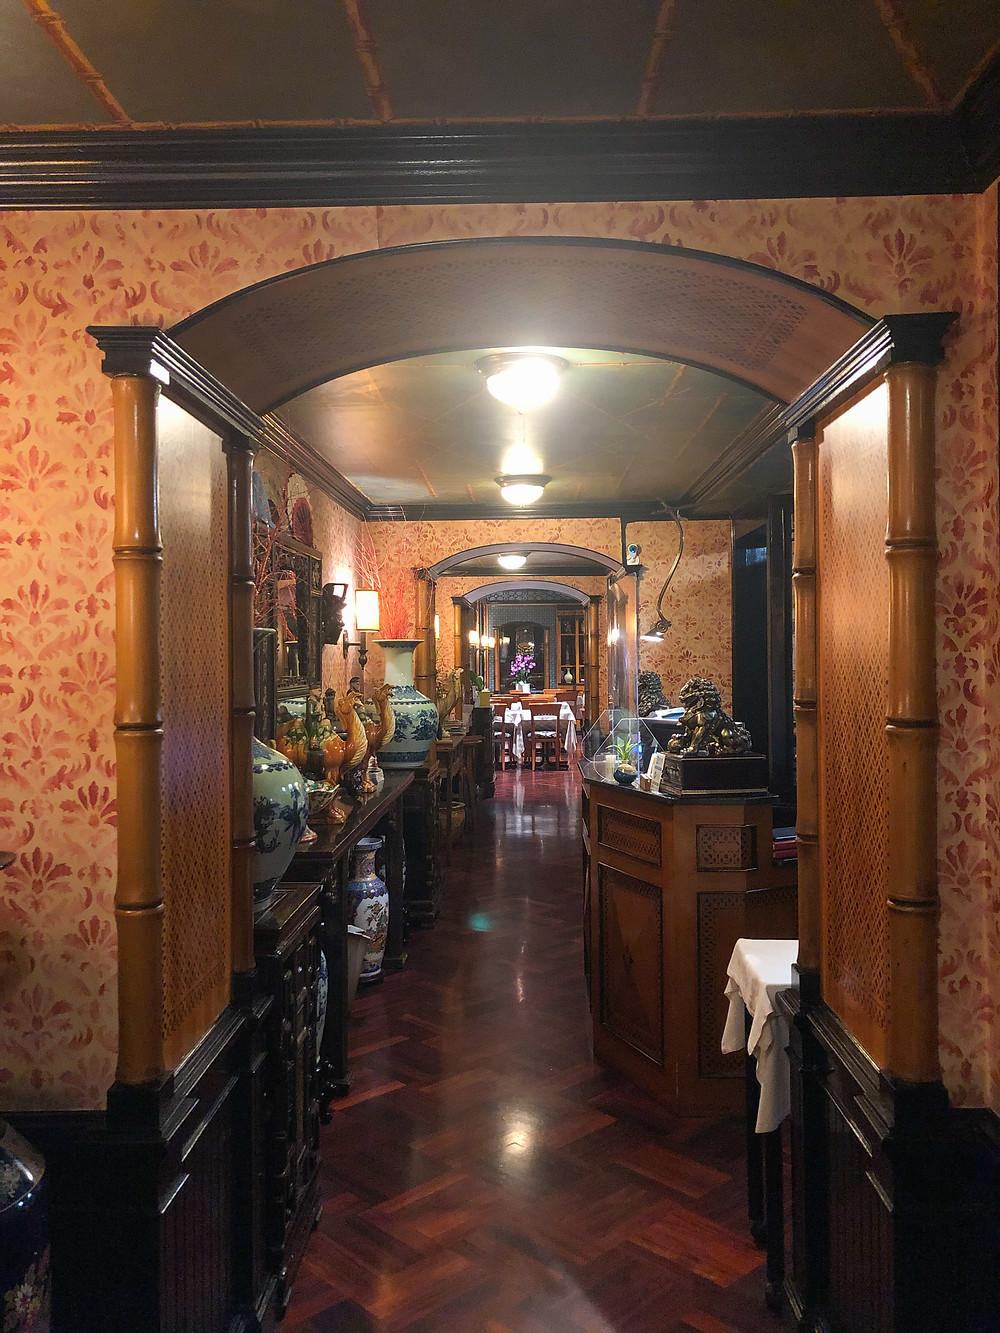 Shangri La ristorante Cookingwiththehamster